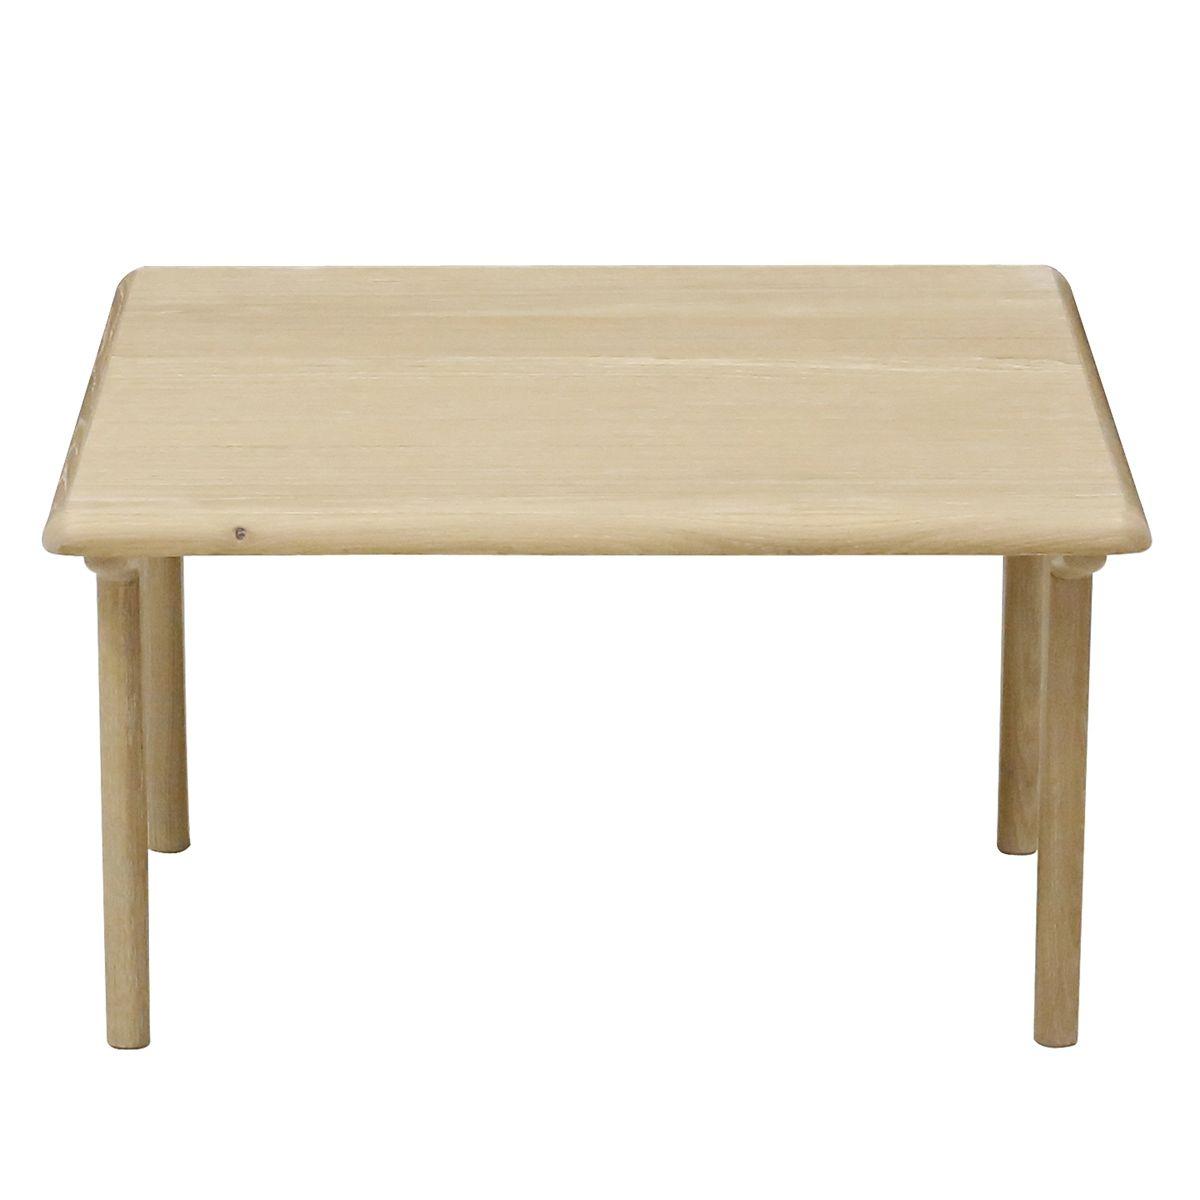 table basse plaqu ch ne et ch ne blanchi kol. Black Bedroom Furniture Sets. Home Design Ideas